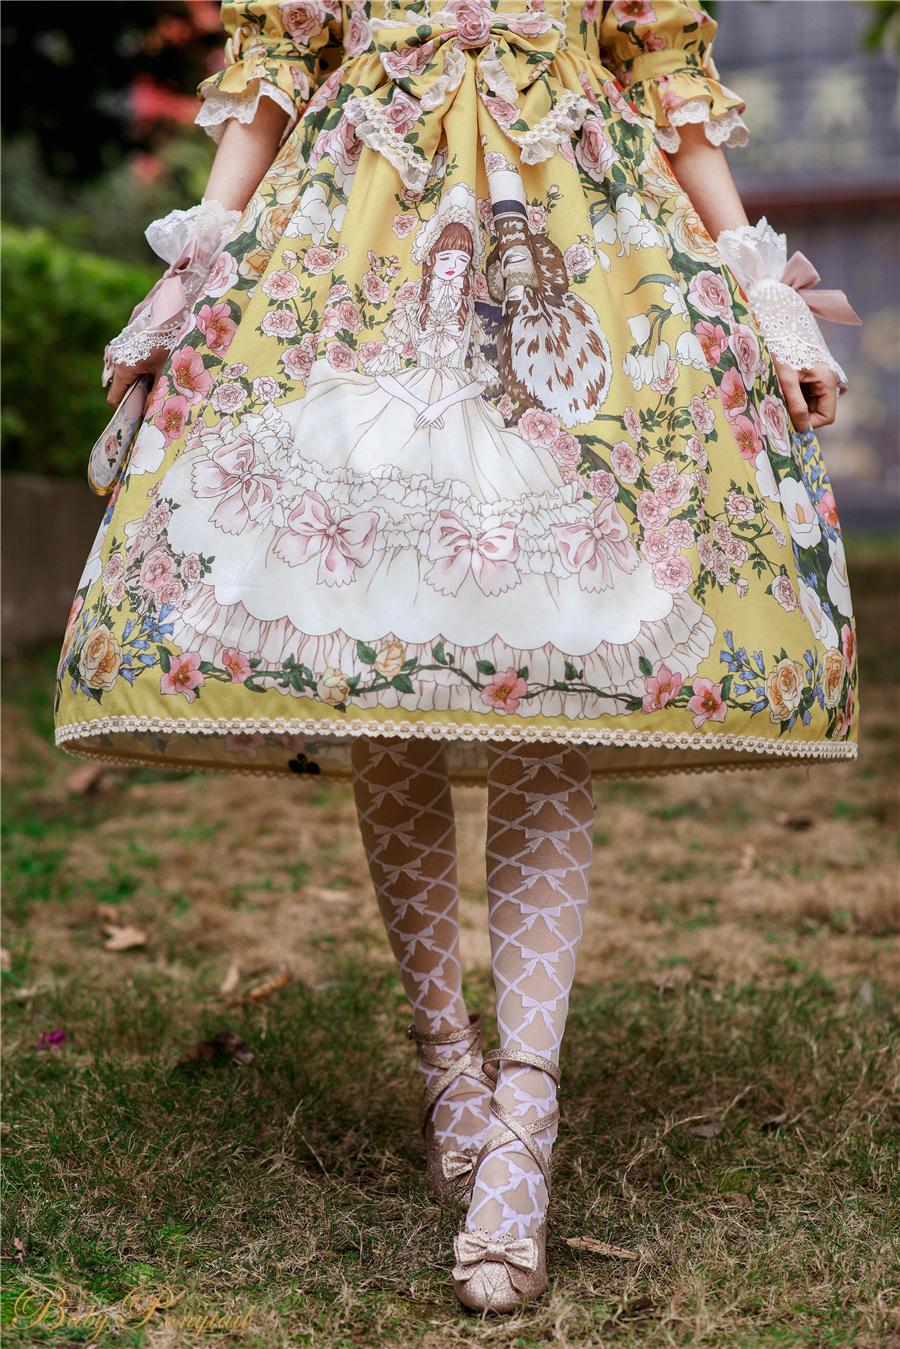 Baby Ponytail_Model Photo_Polly's Garden of Dreams_OP Yellow_Kaka_16.jpg